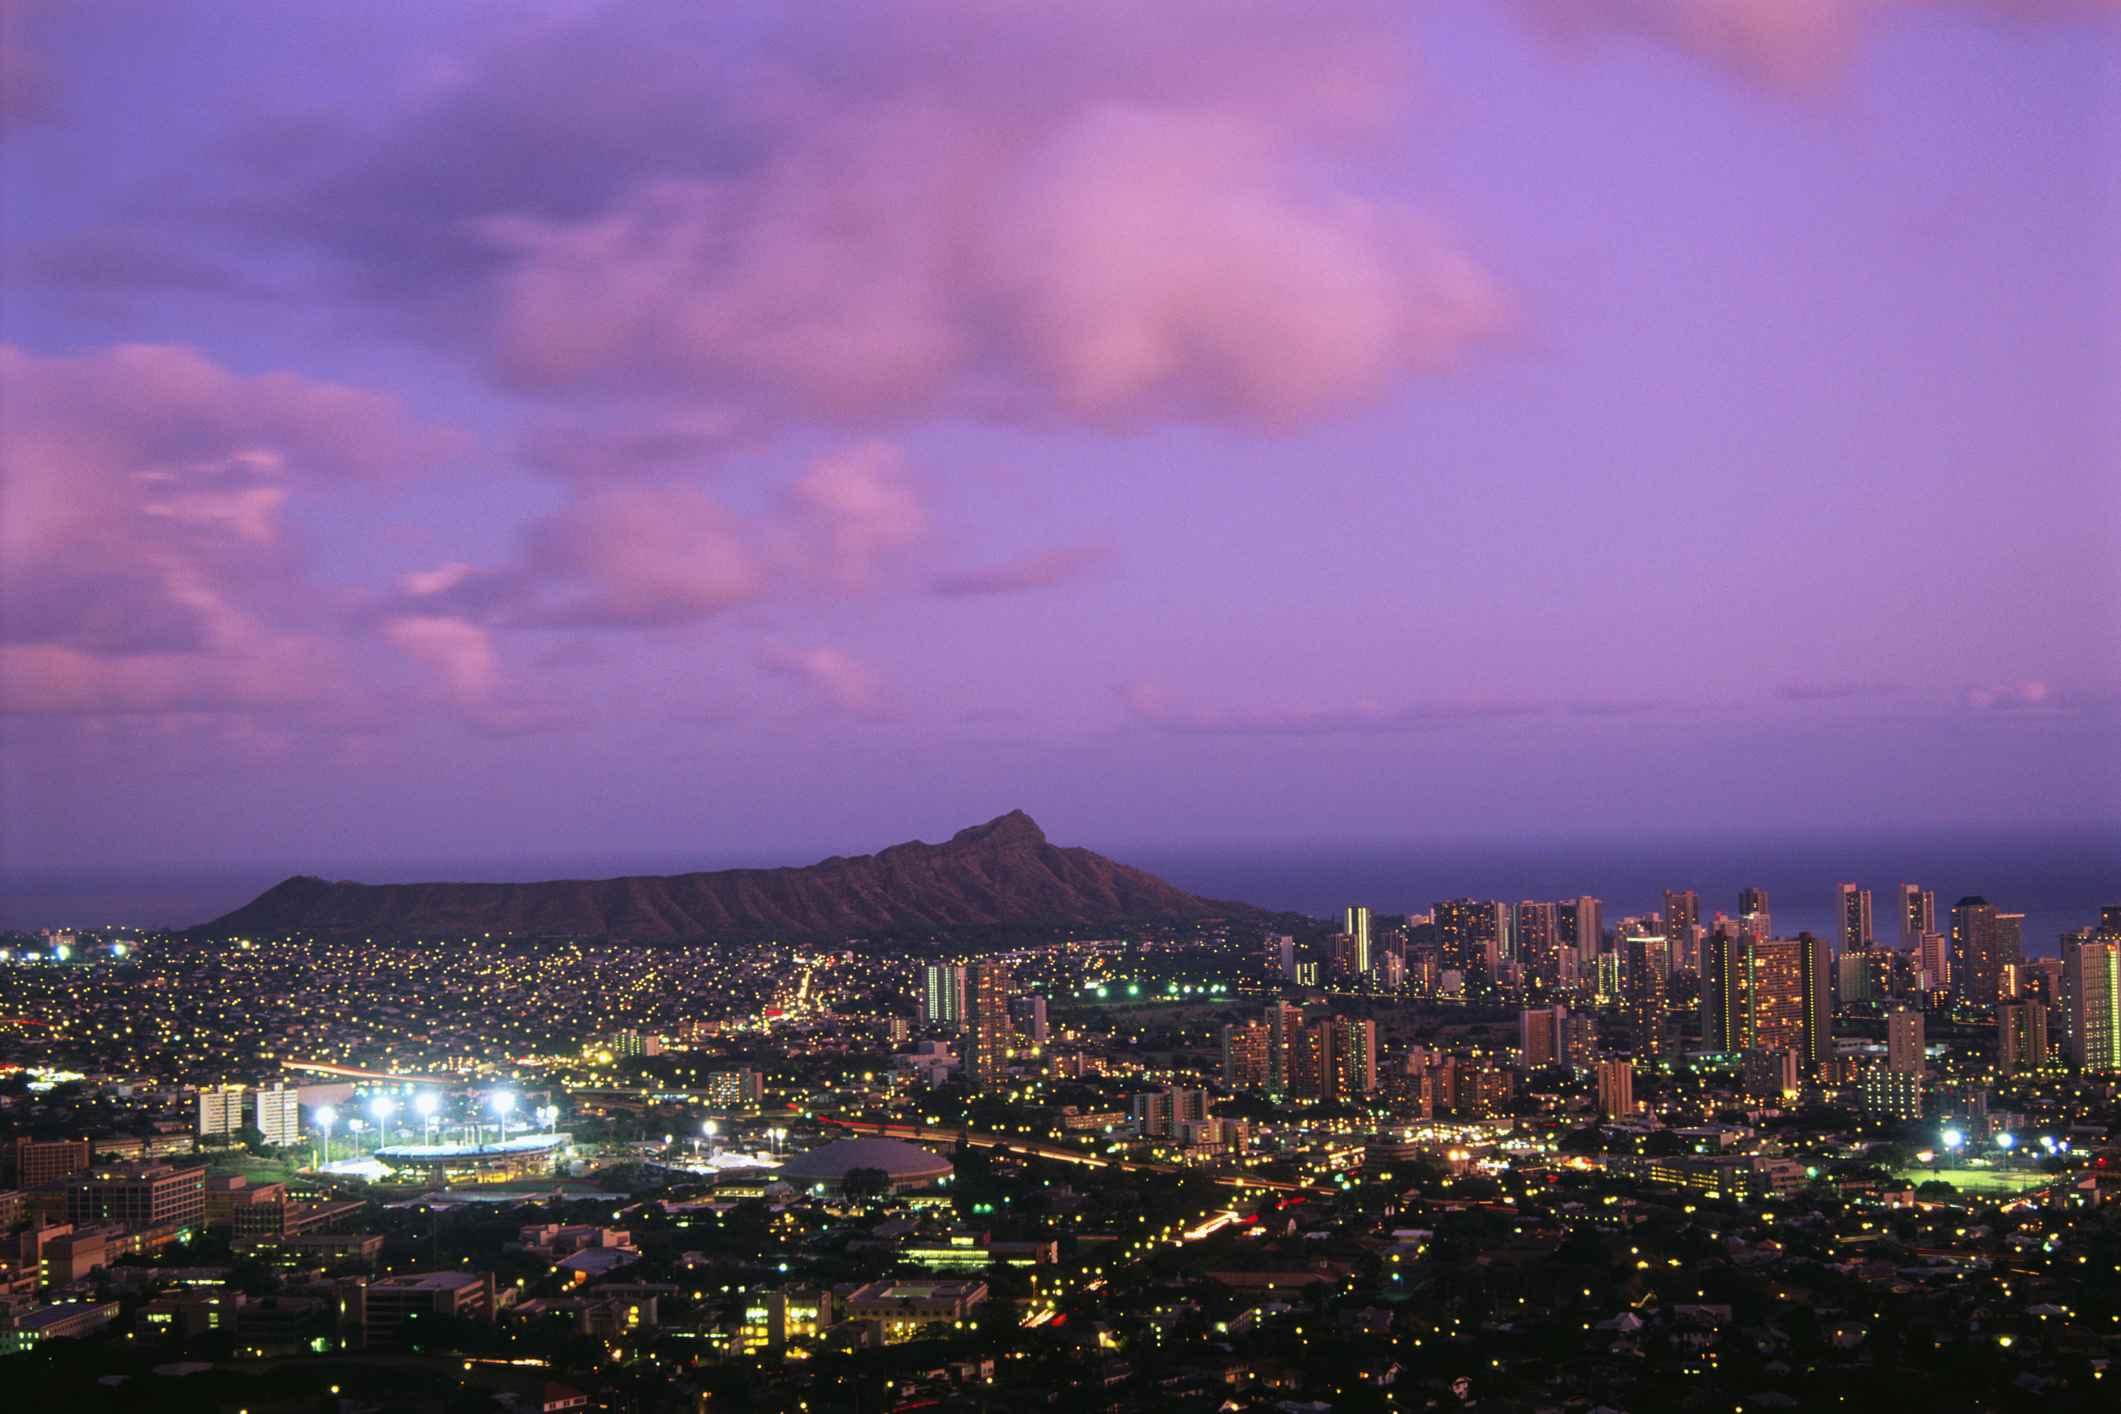 City Lights of Waikiki